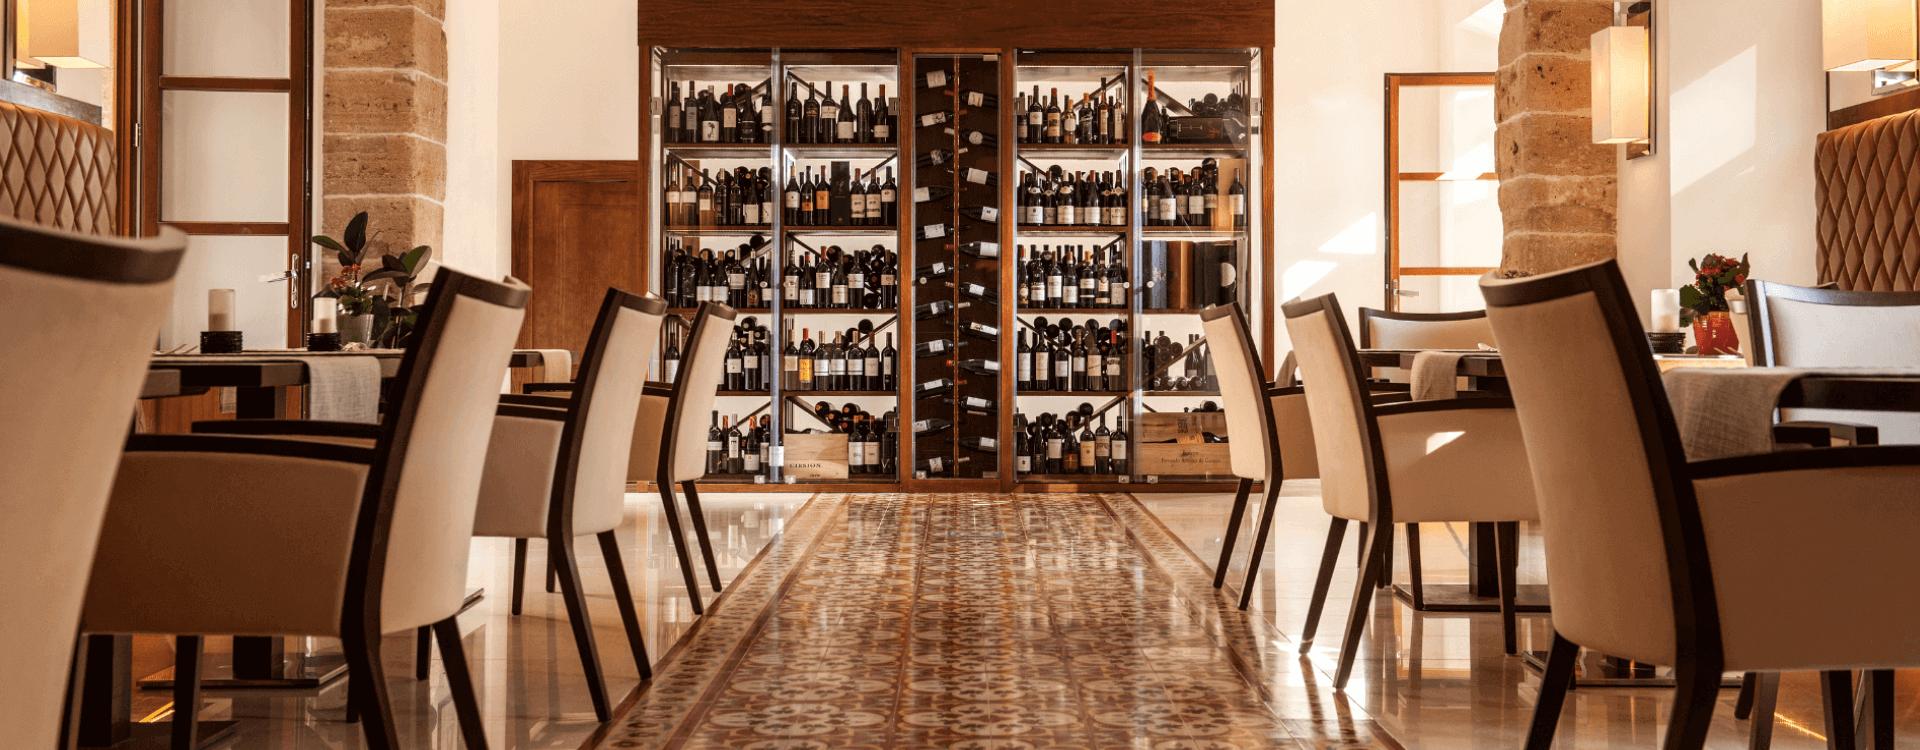 Olivera Restaurant Castell Son Claret, Mallorca